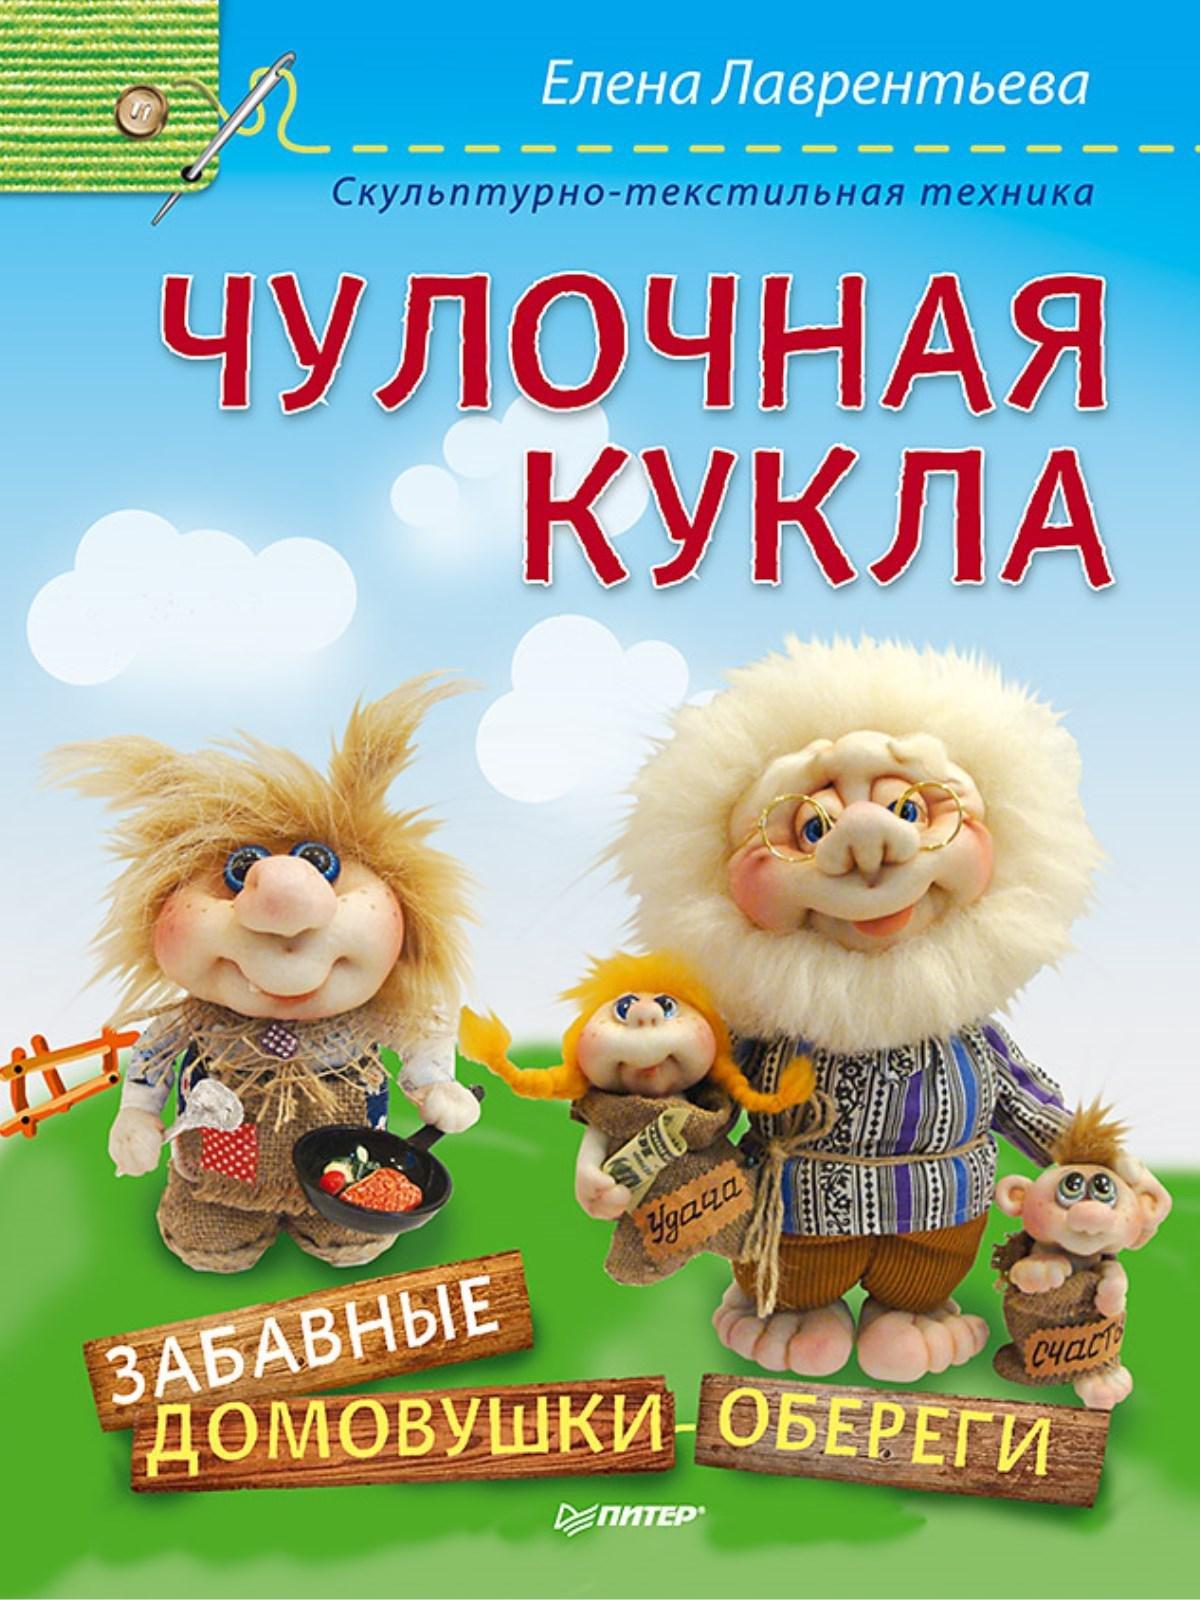 Лаврентьева Елена Владимировна - Чулочная кукла. Забавные домовушки-обереги